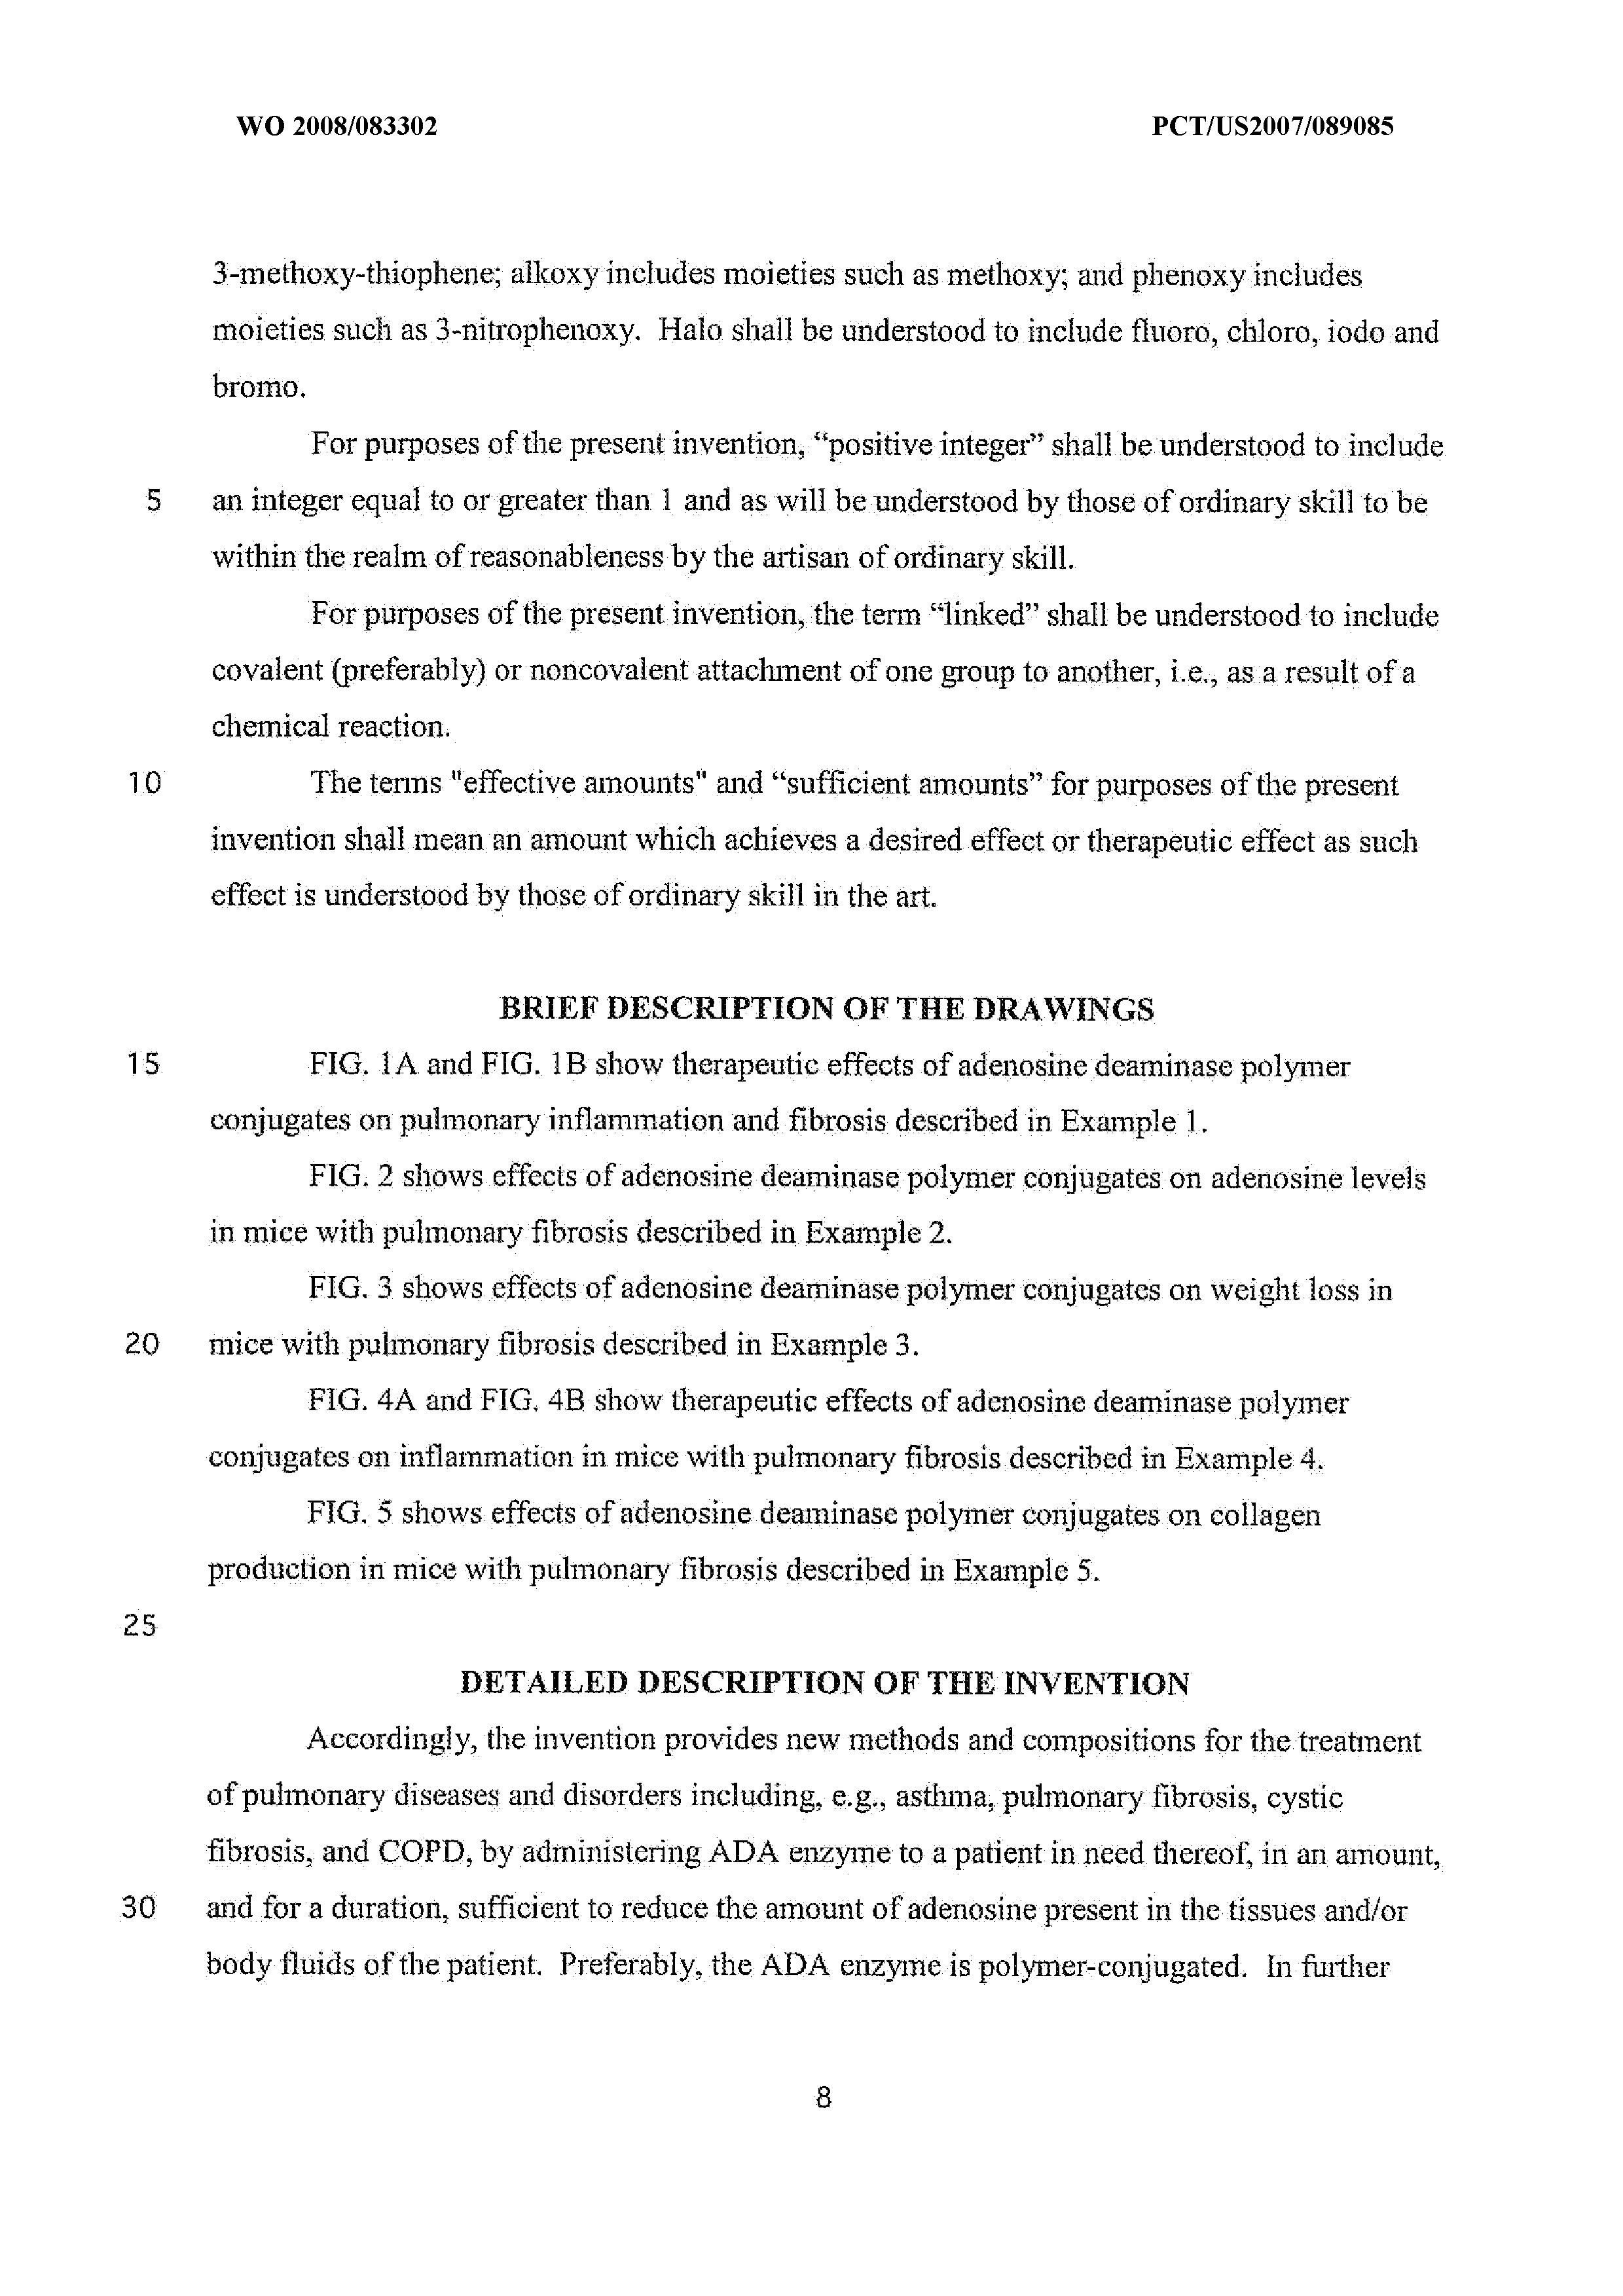 WO 2008/083302 A2 - Use Of Adenosine Deaminase For Treating